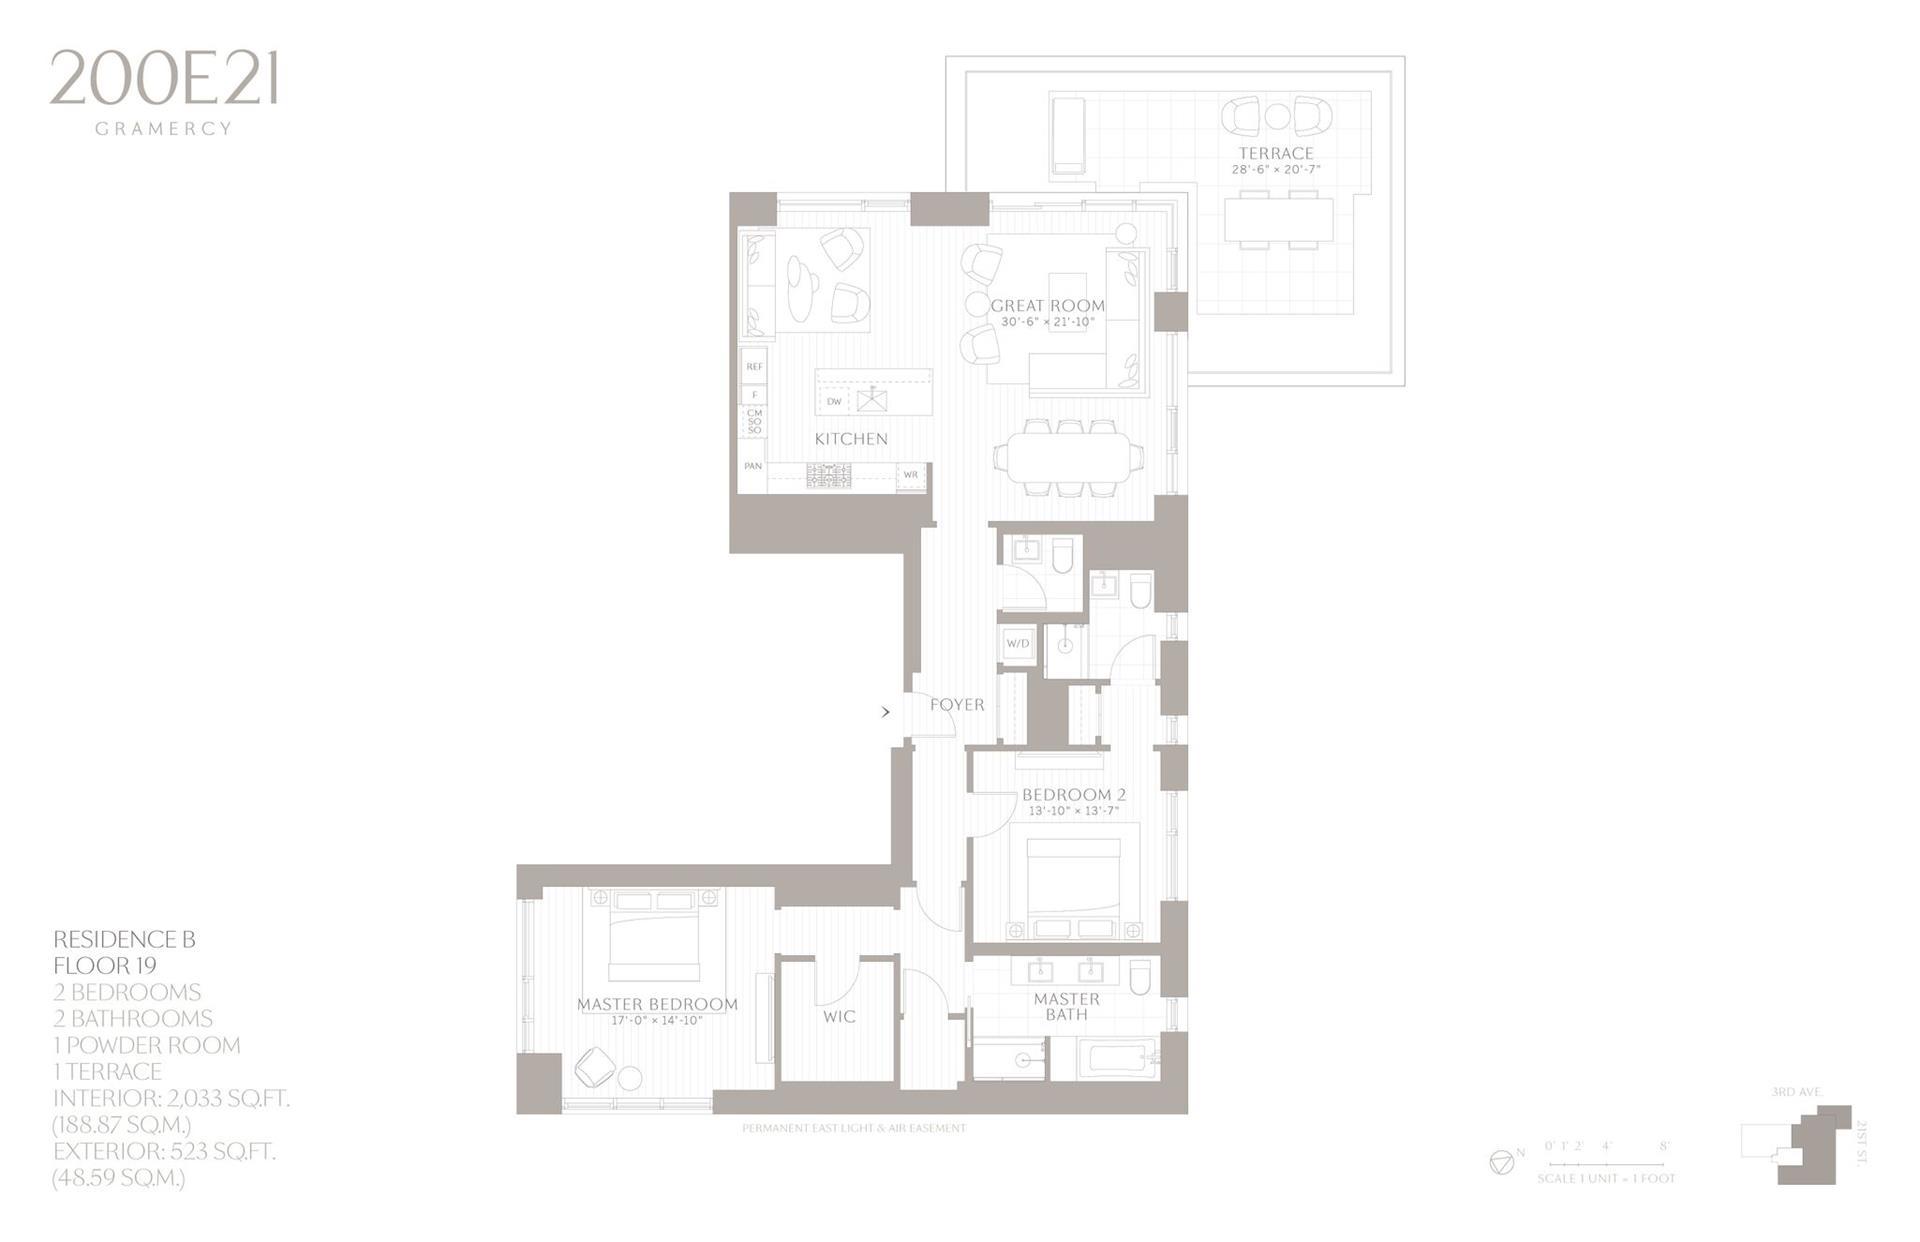 Floor plan of 200 East 21st Street, 19B - Gramercy - Union Square, New York